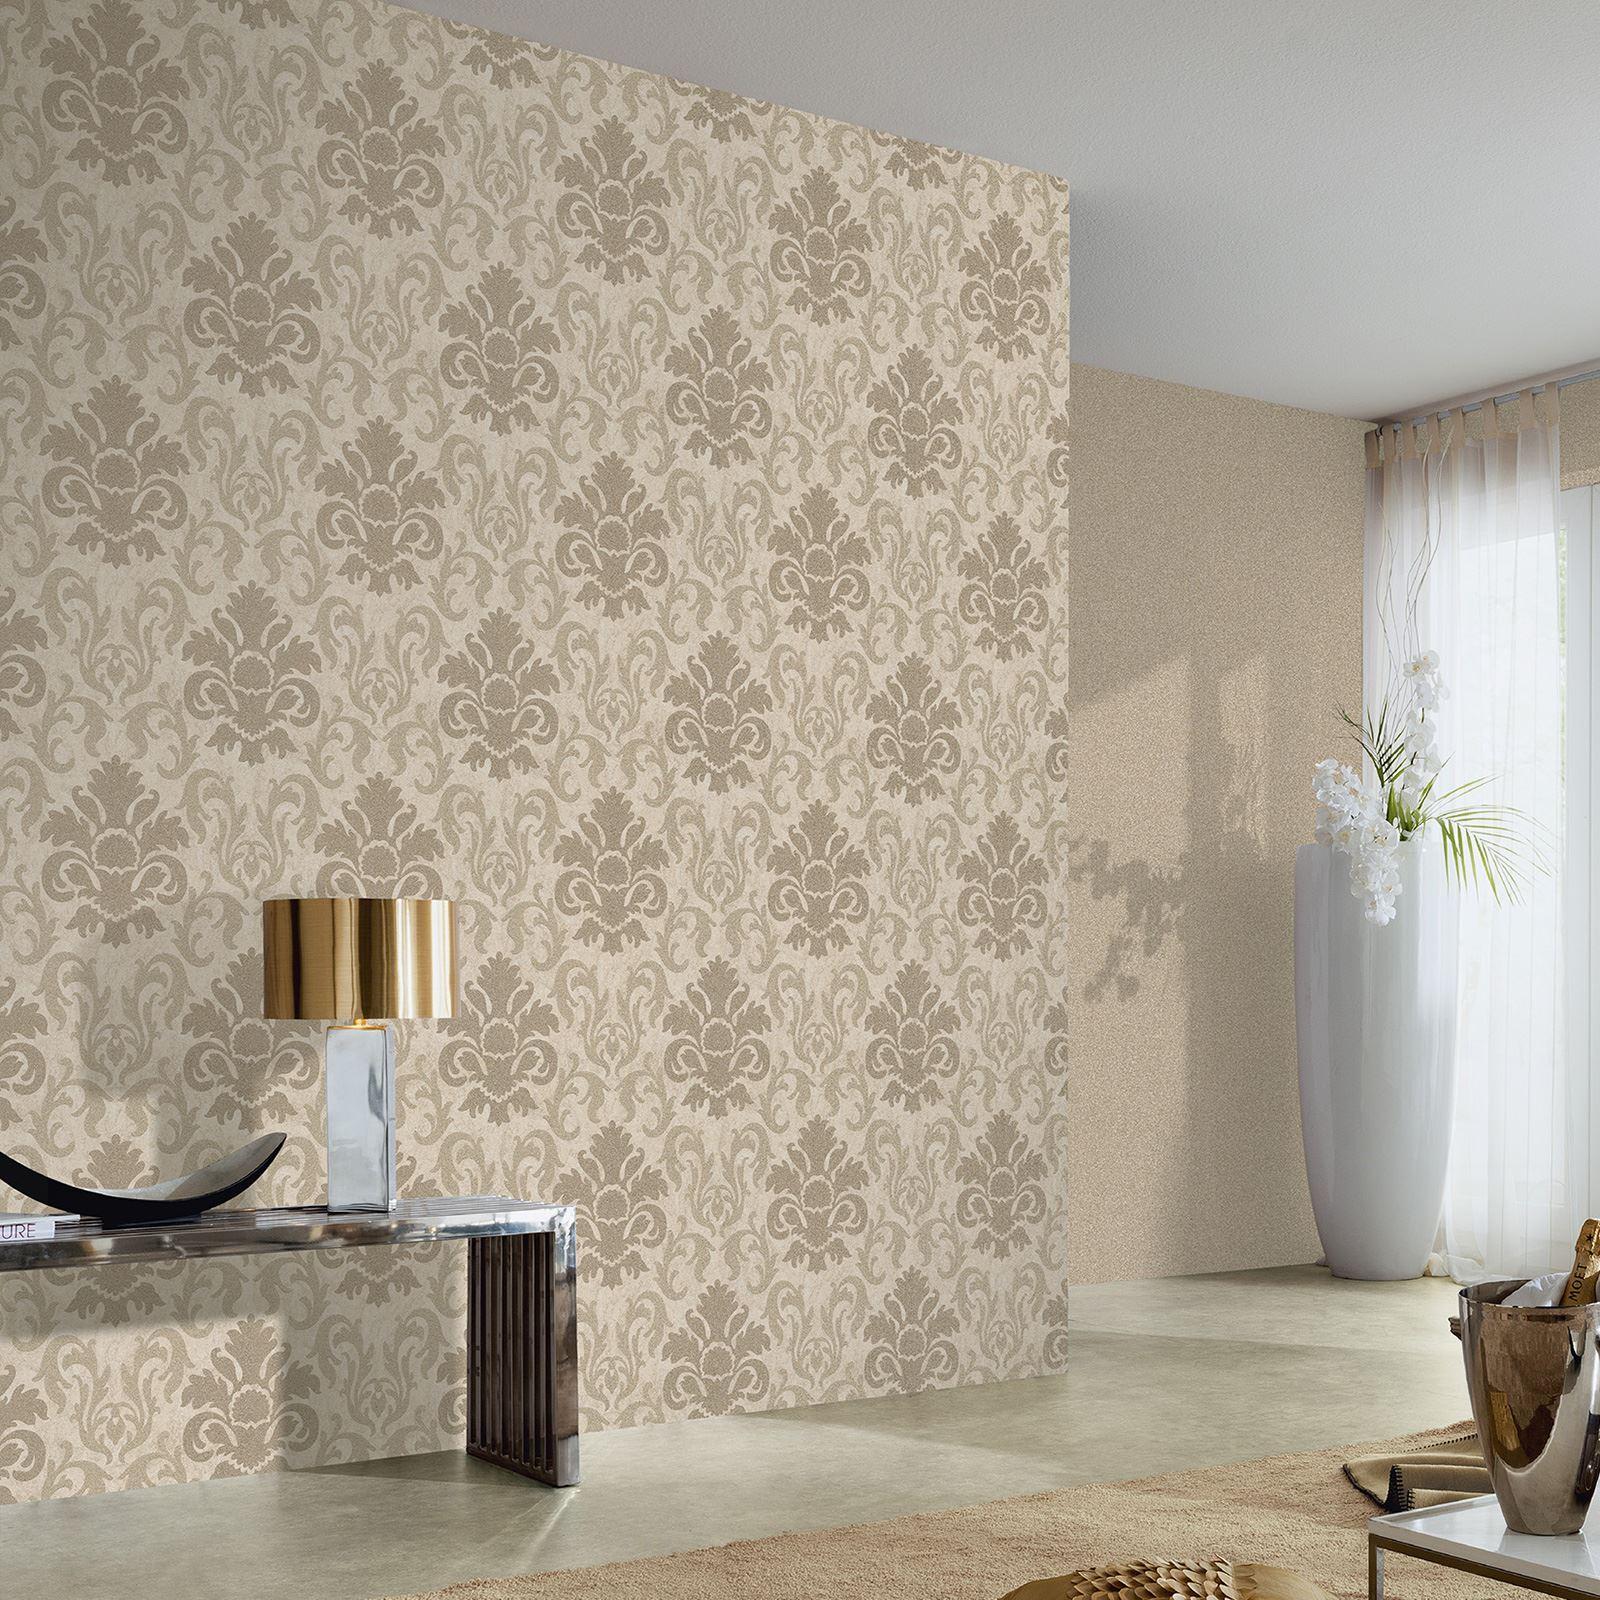 P s carat damask glitter wallpaper feature wall decor for Silver bedroom wall art